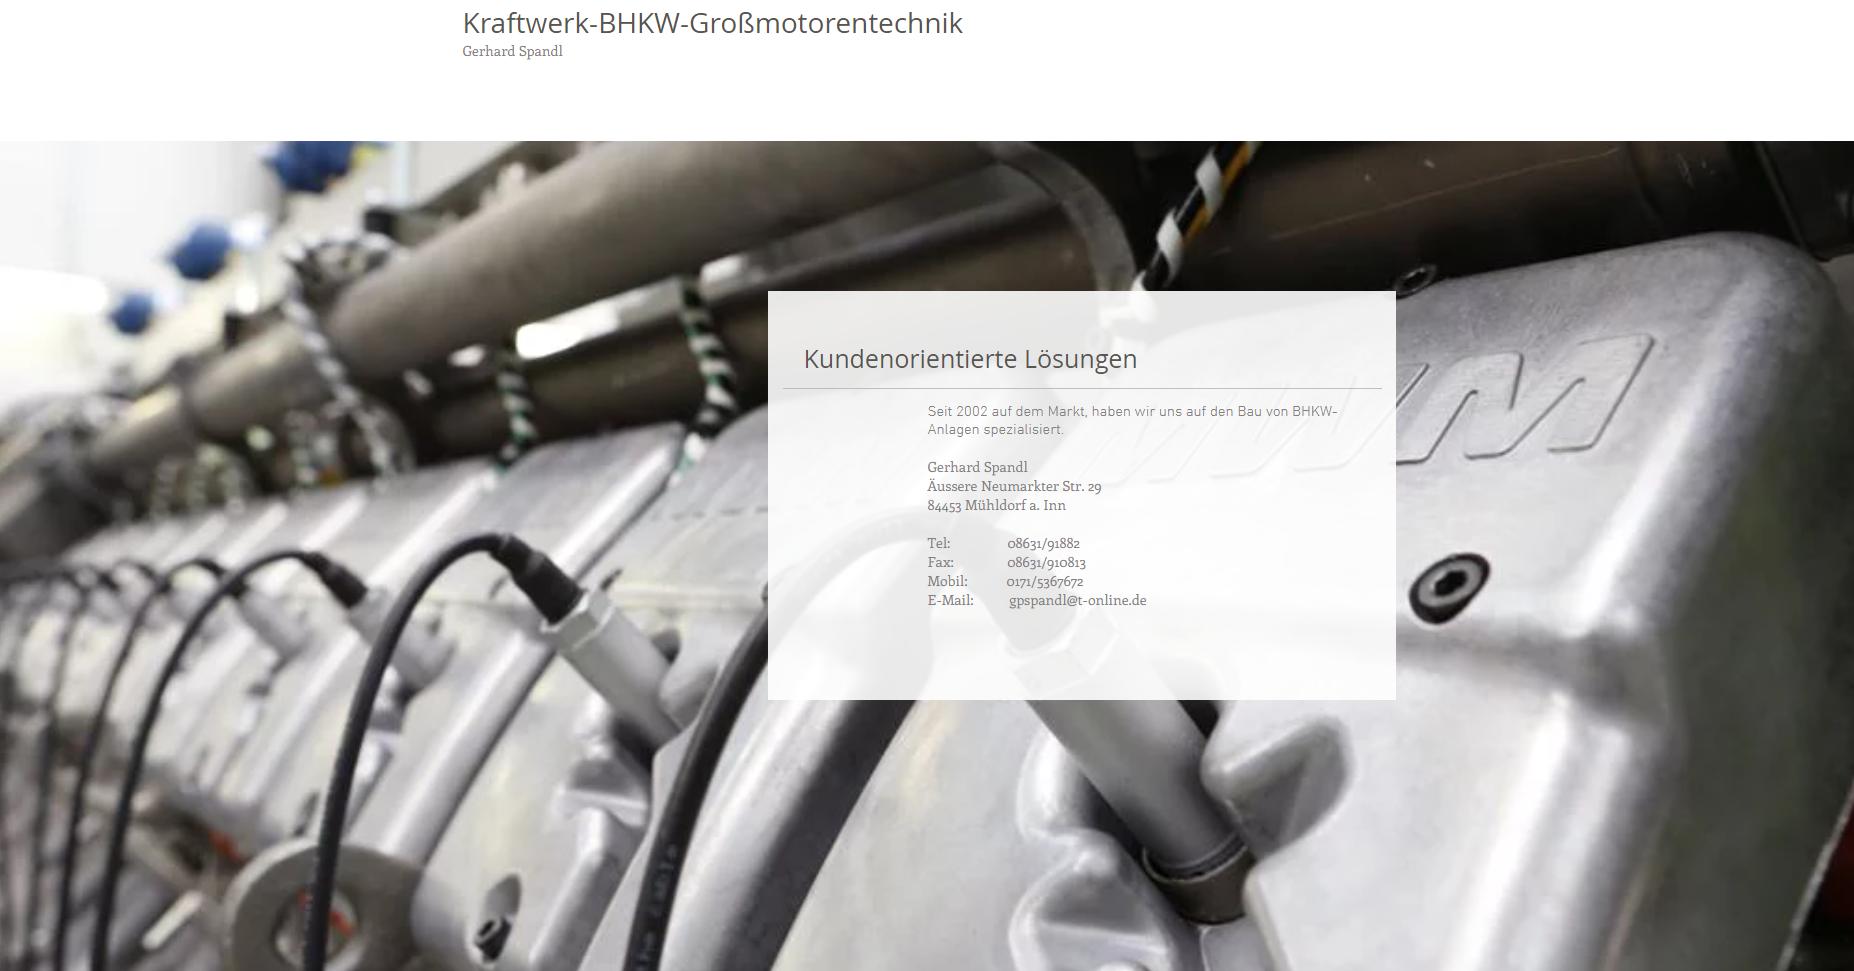 Spandl - Kraftwerk-BHKW-Großmotorent